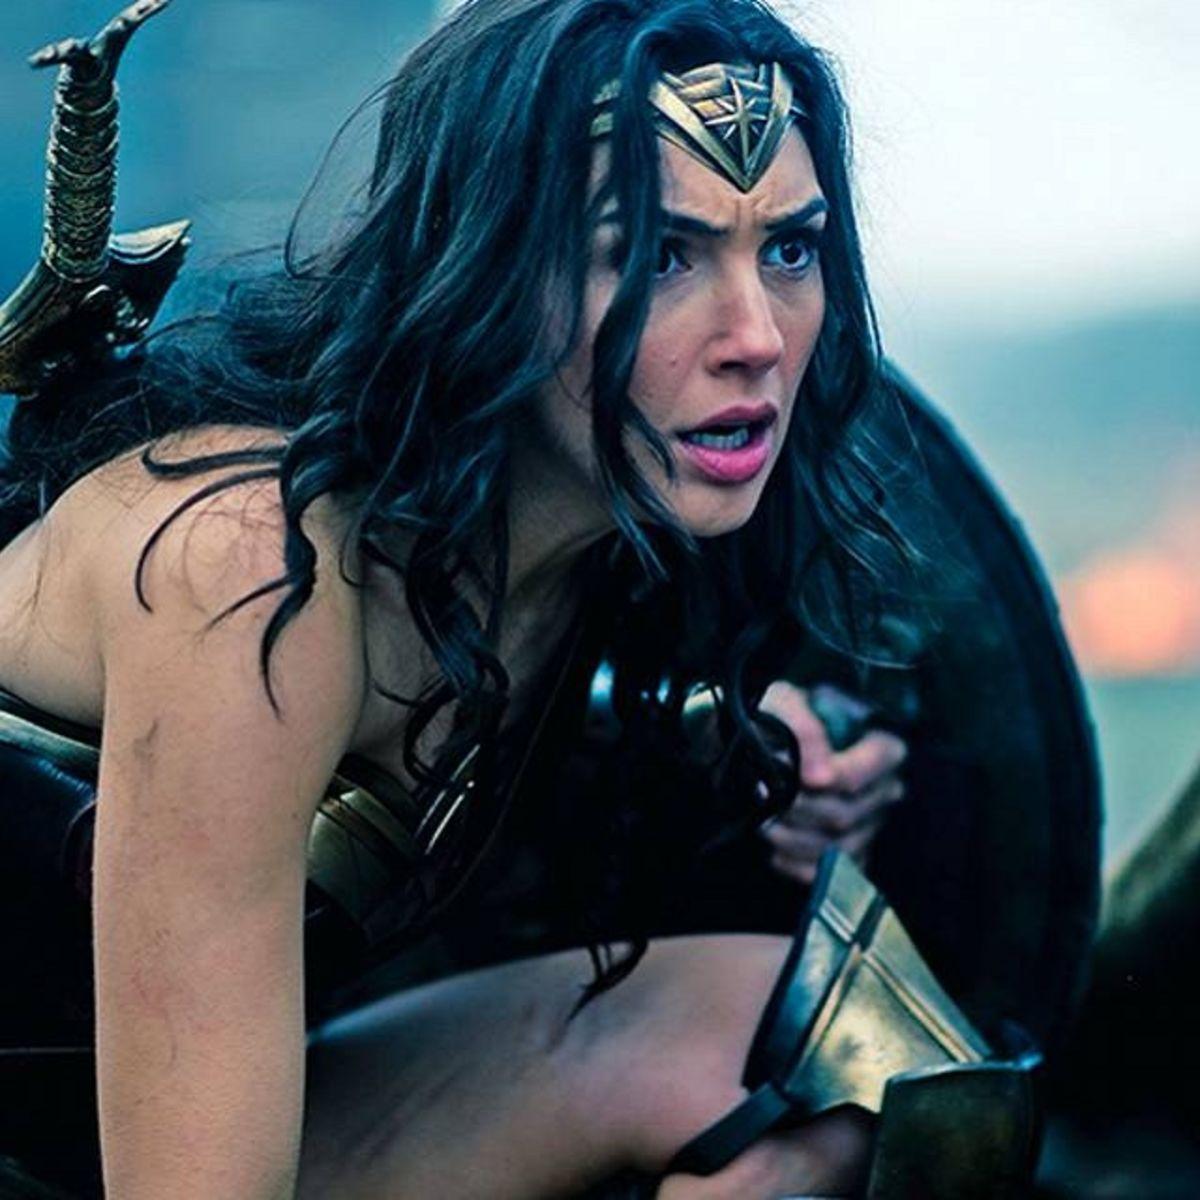 Wonder-Woman-Gal-Gadot_.jpg